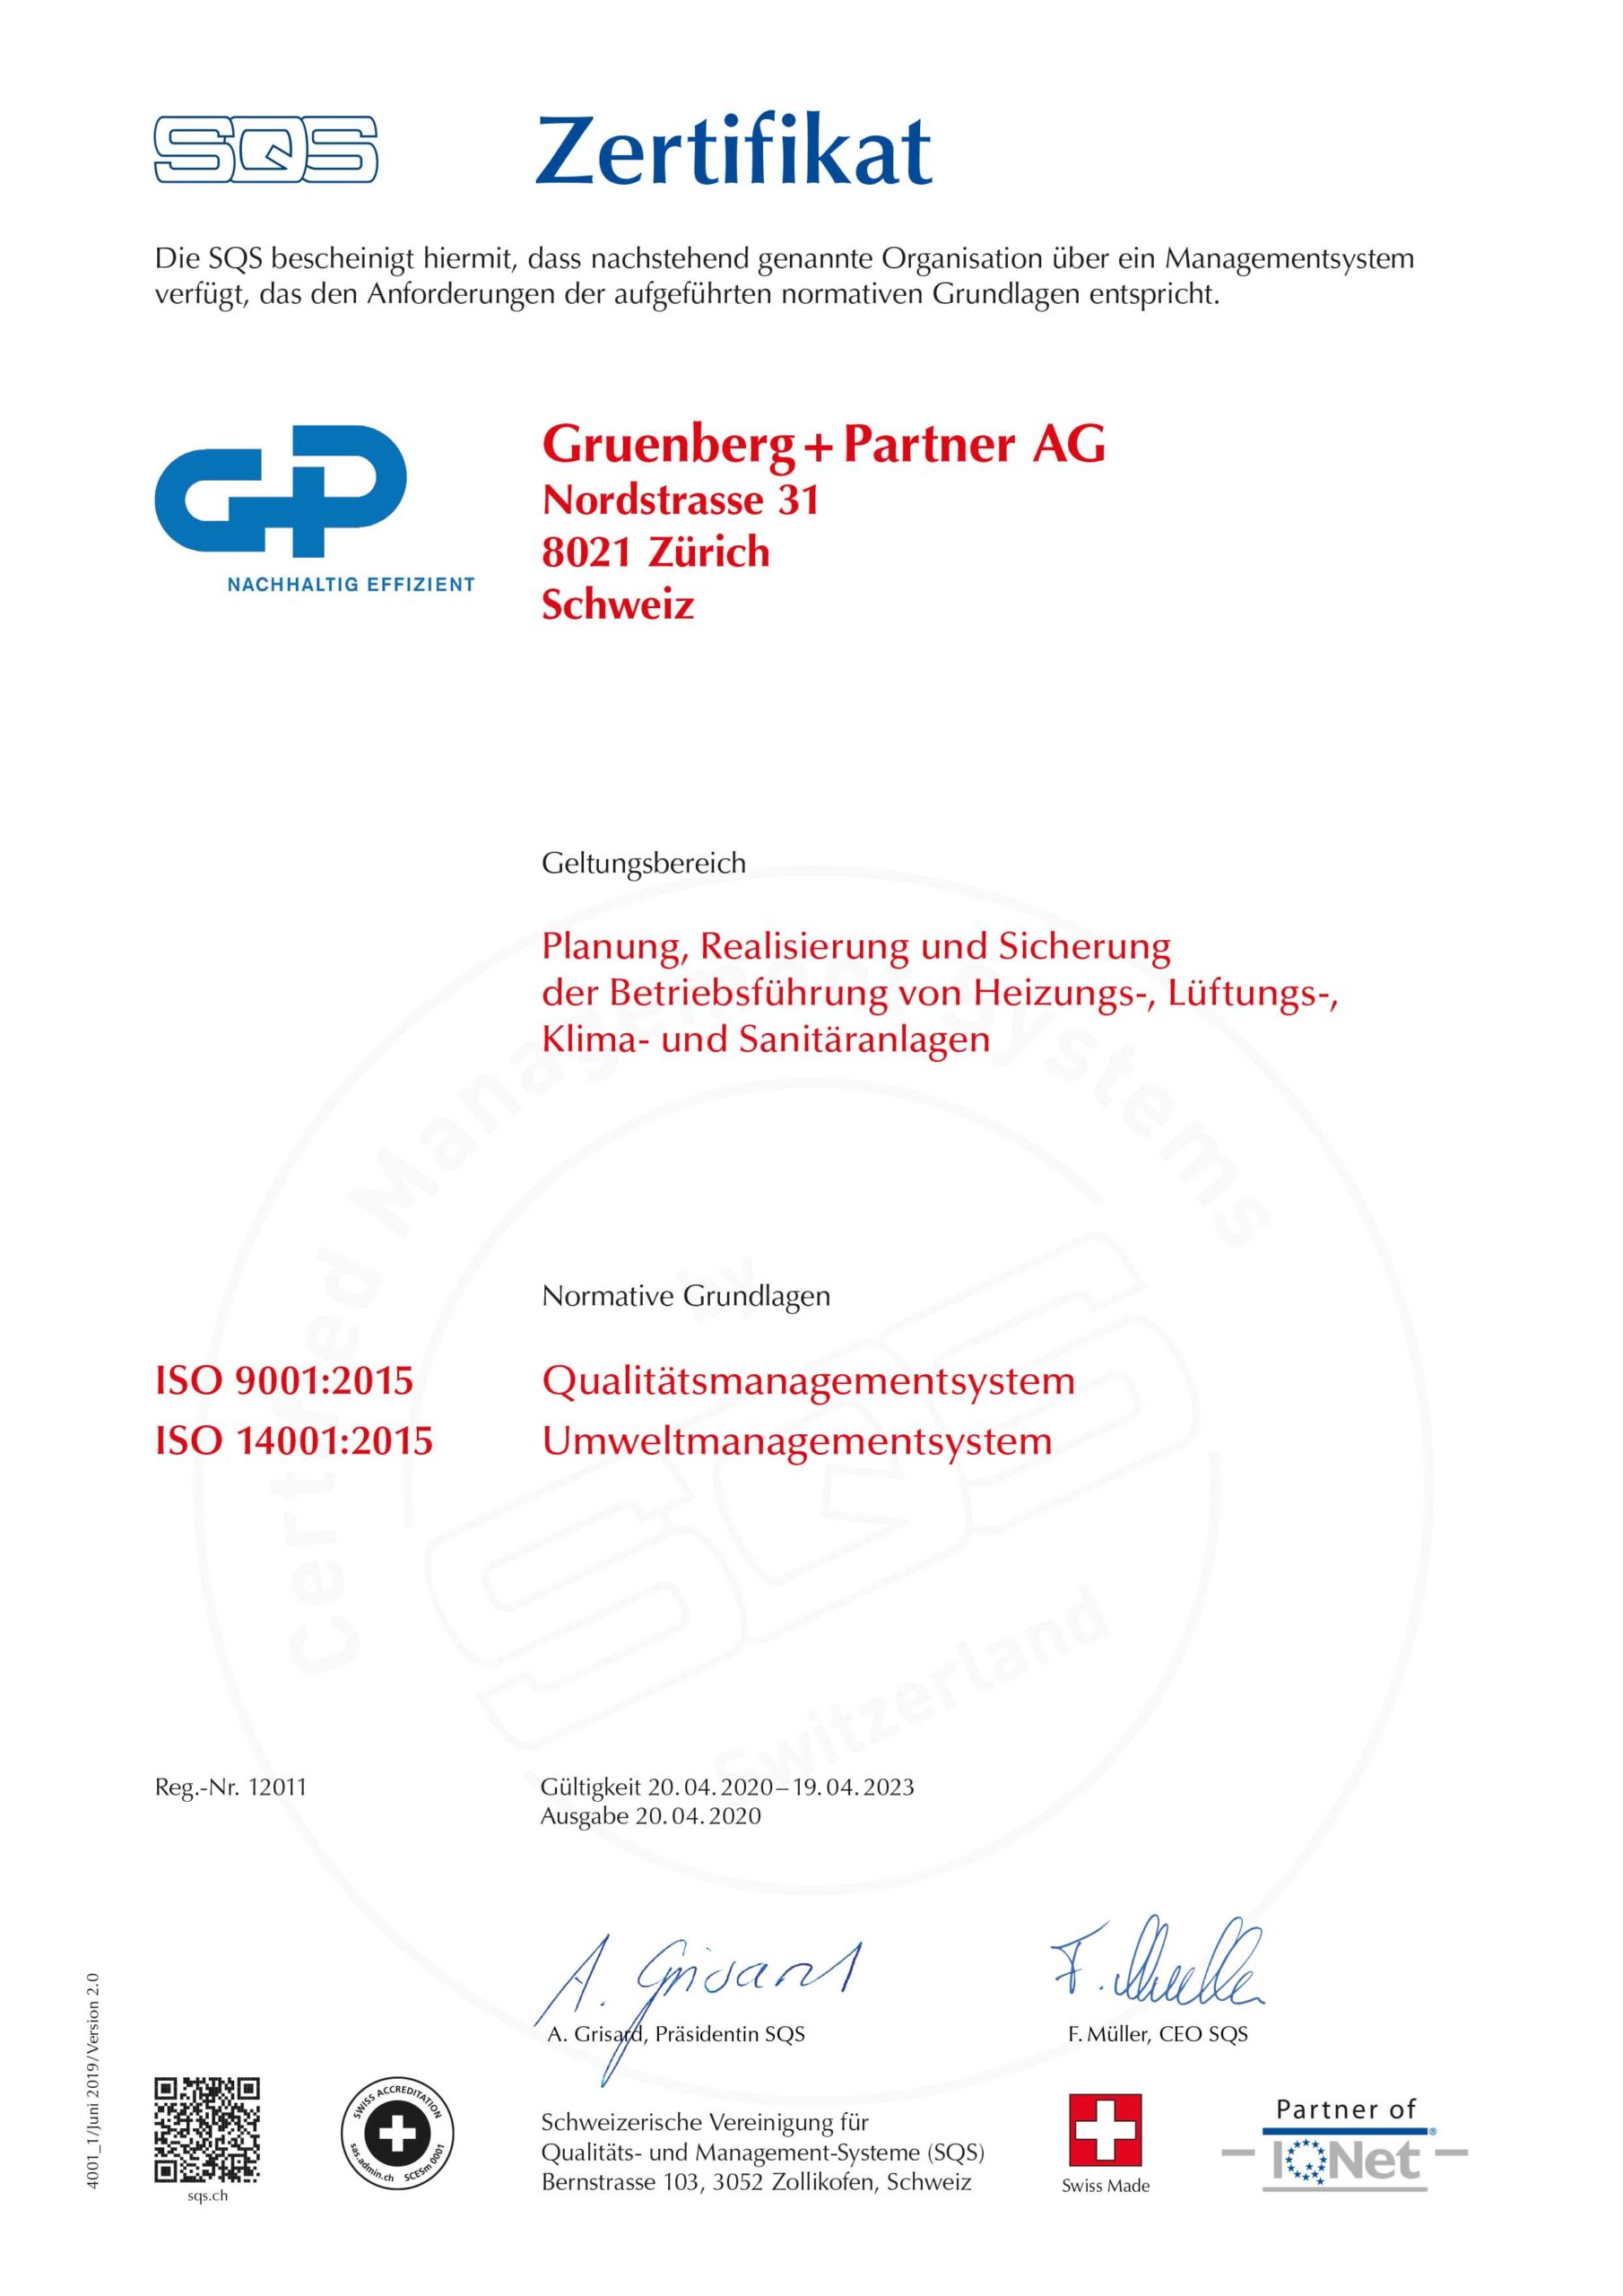 g+p_zertifikat